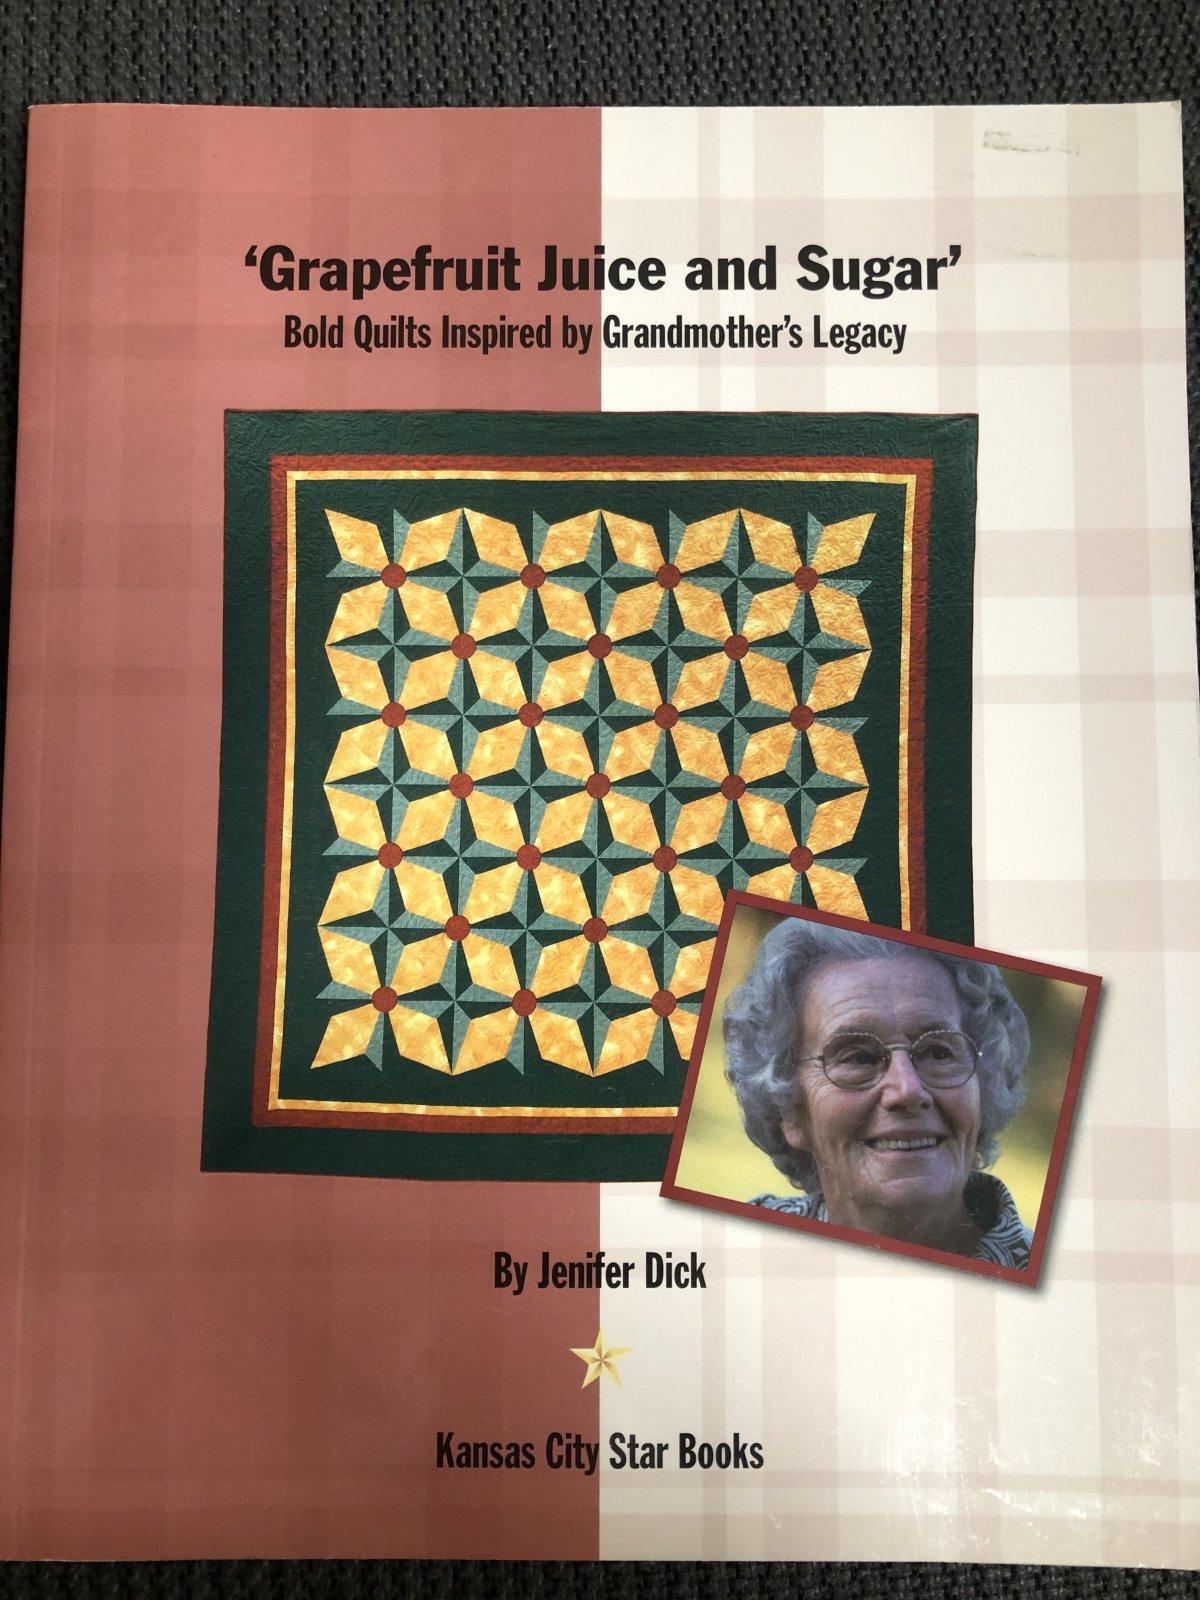 Grapefruit Juice and Sugar